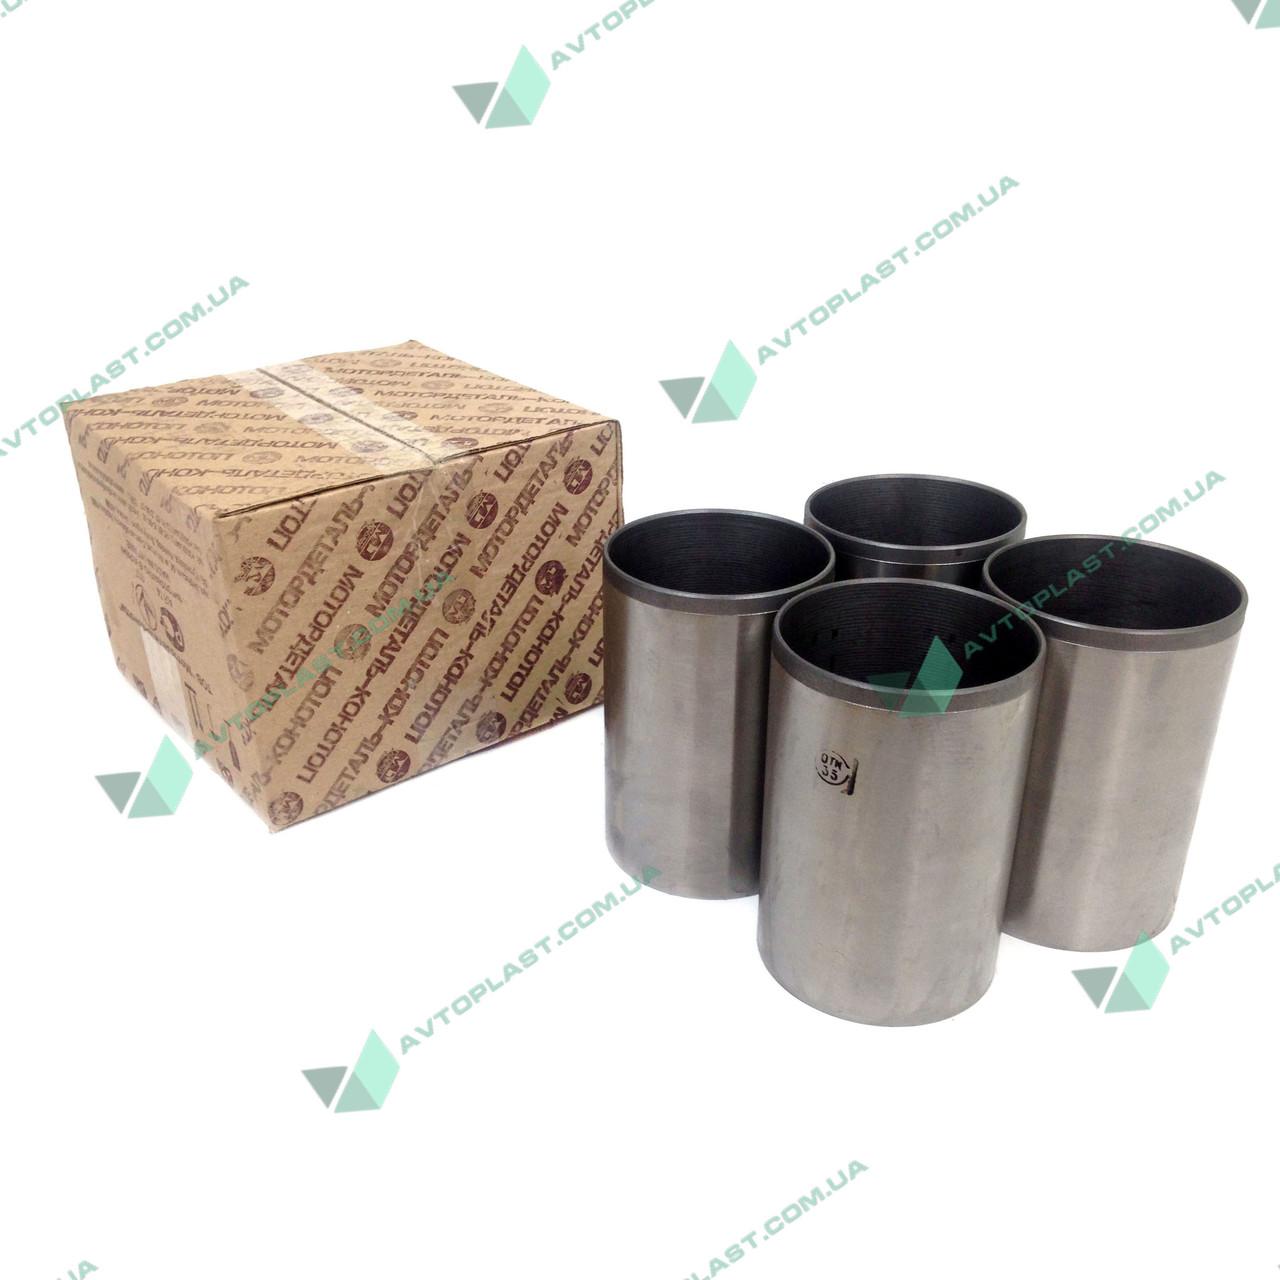 Гильза блока цилиндра Газель,УАЗ дв.4215 (Д=107) (компл.4шт) (пр-во г.Конотоп)